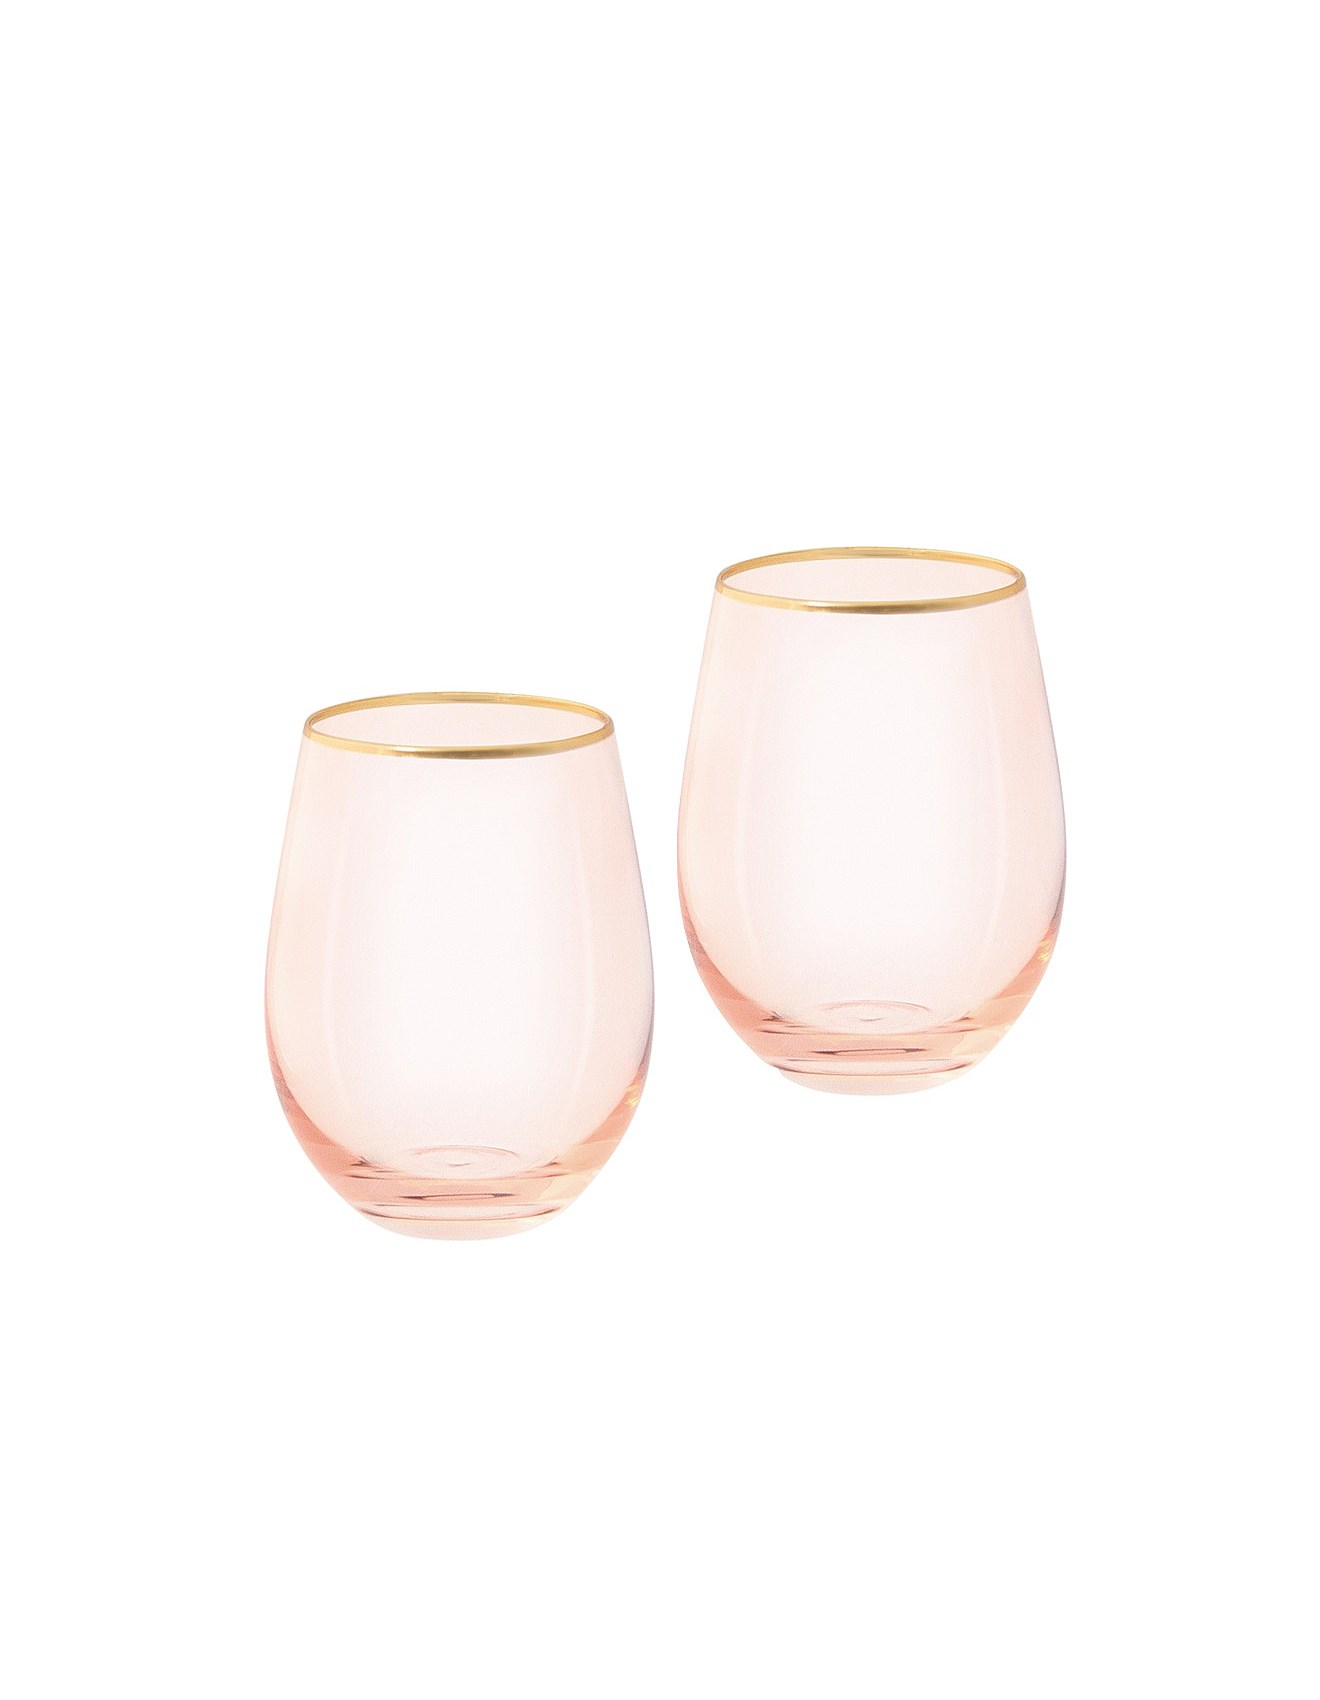 Cristina Re Buy Cristina Re Online David Jones Crystal Coupe Glass Pair